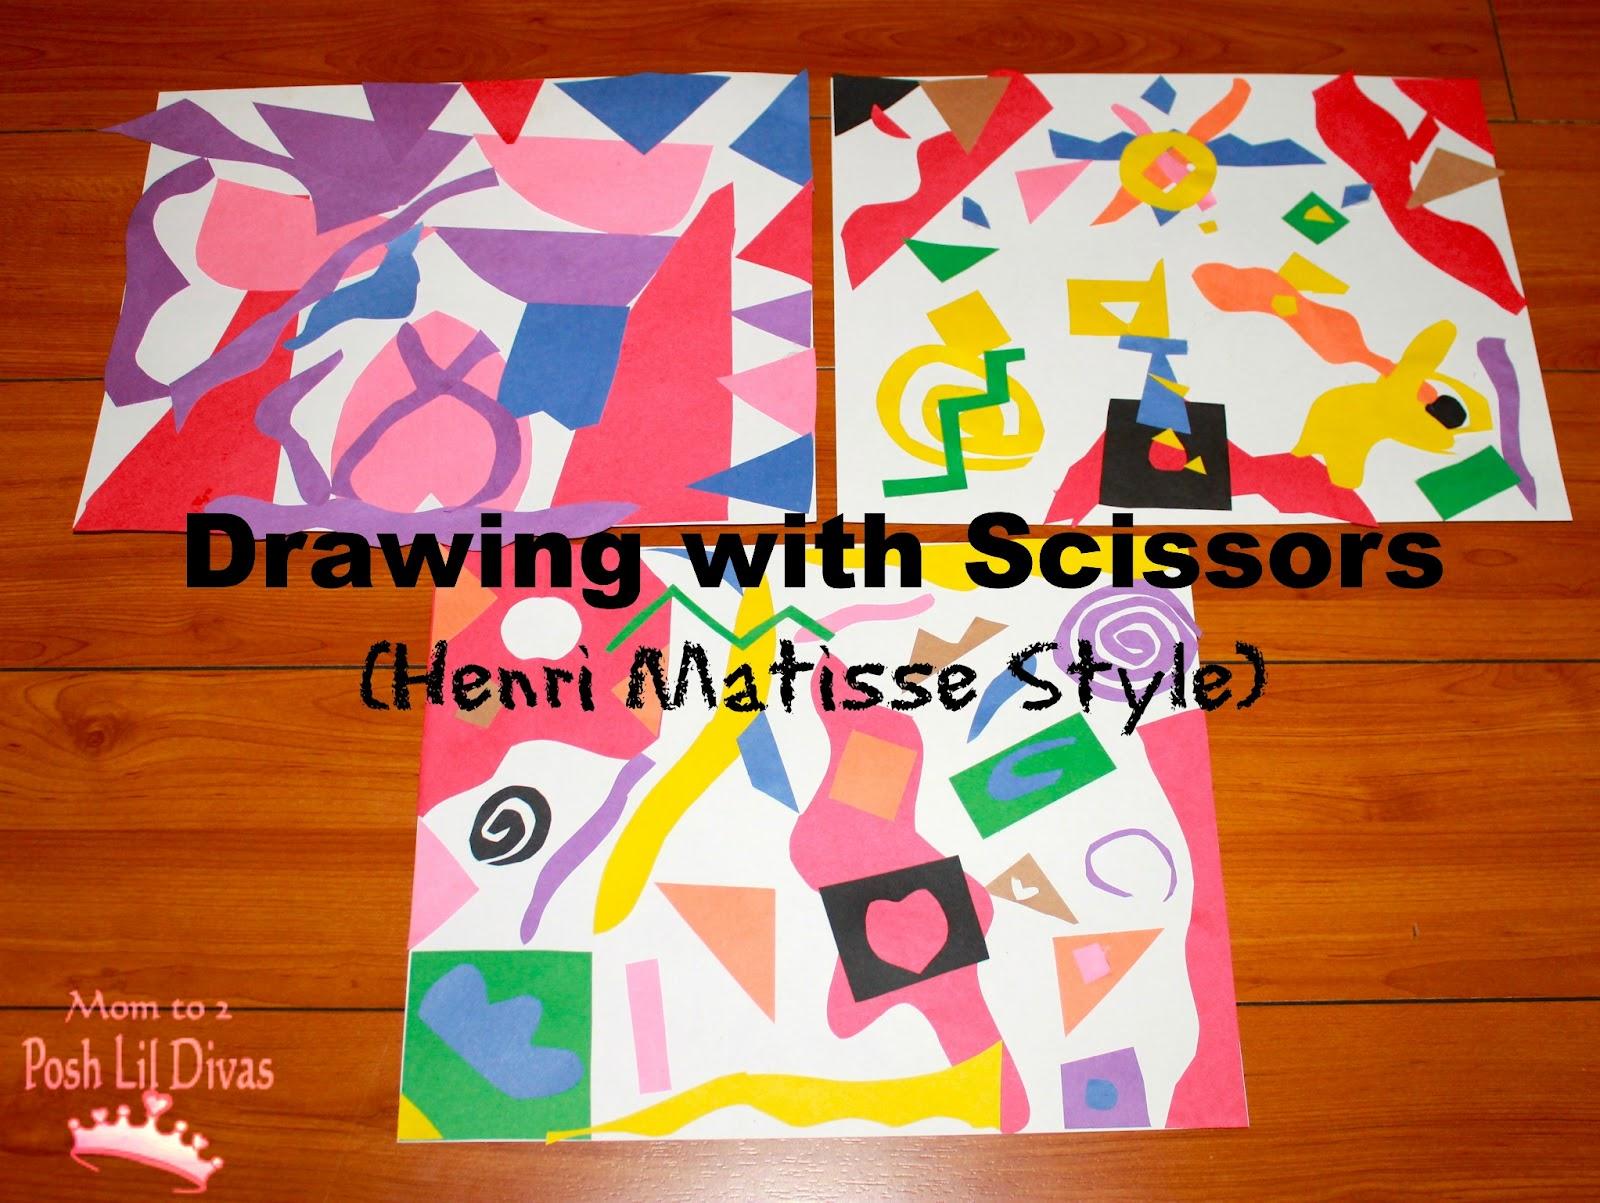 mom to 2 posh lil divas kids get arty drawing with scissors like